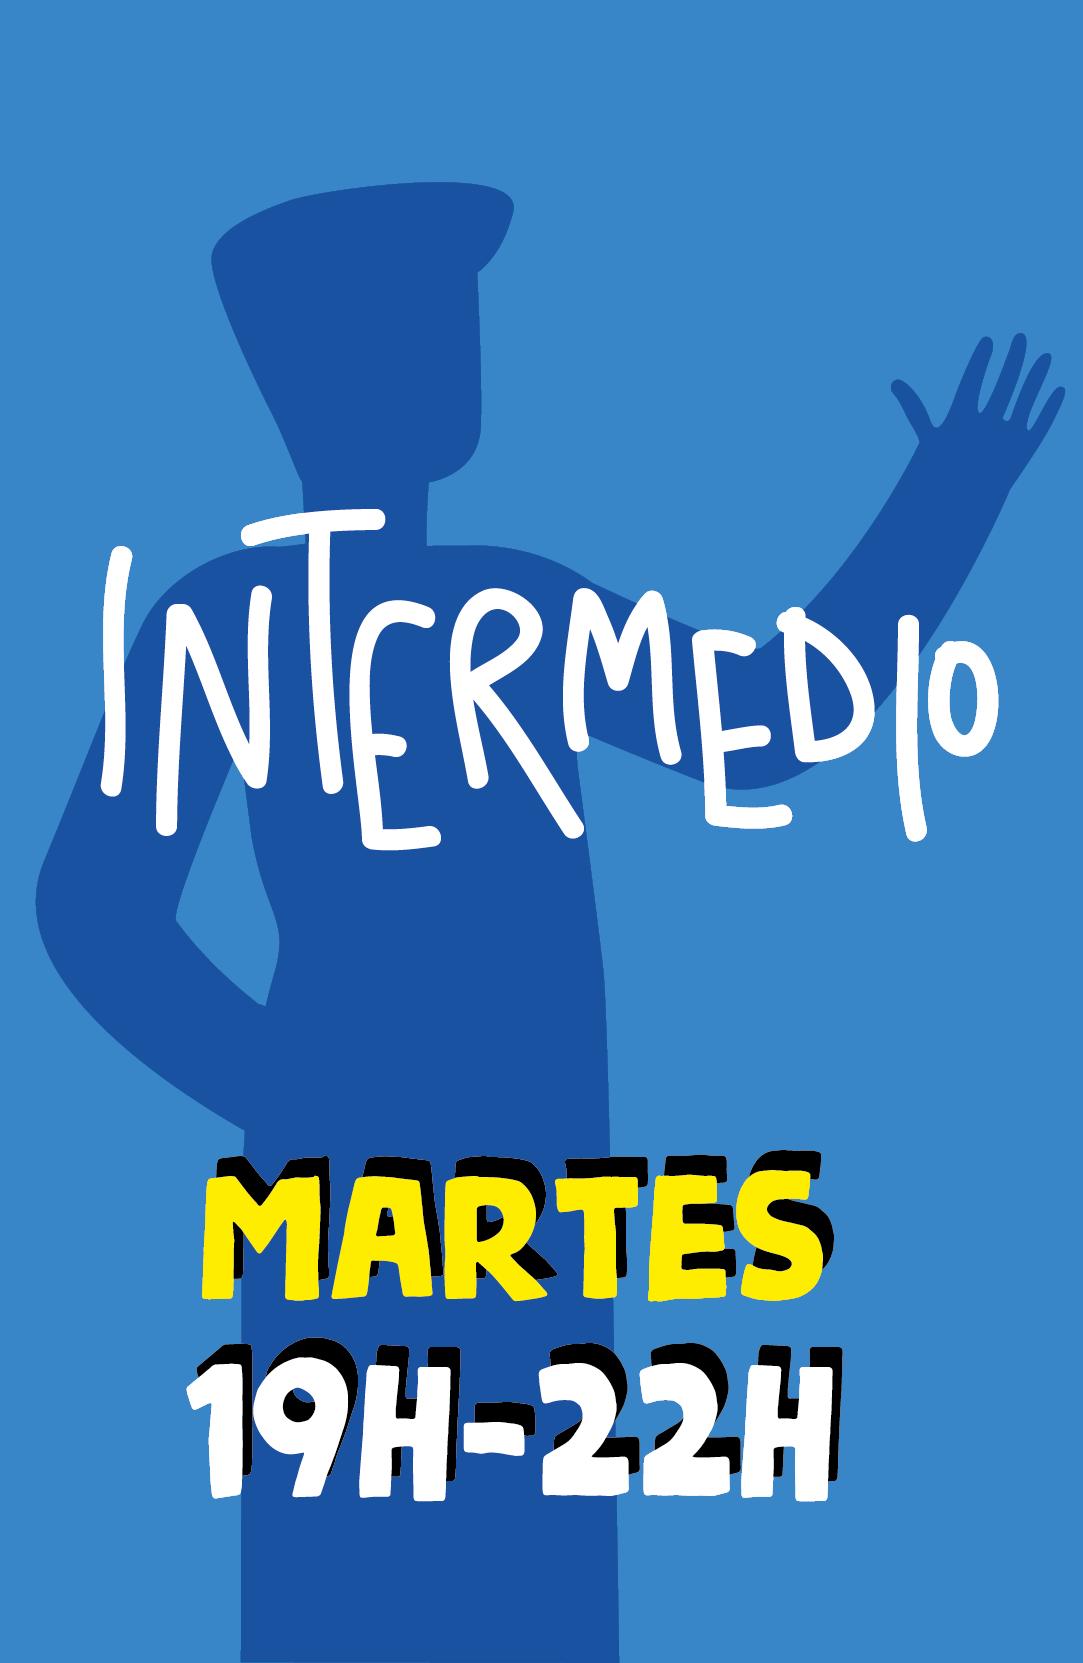 cuadro_martes_01.png